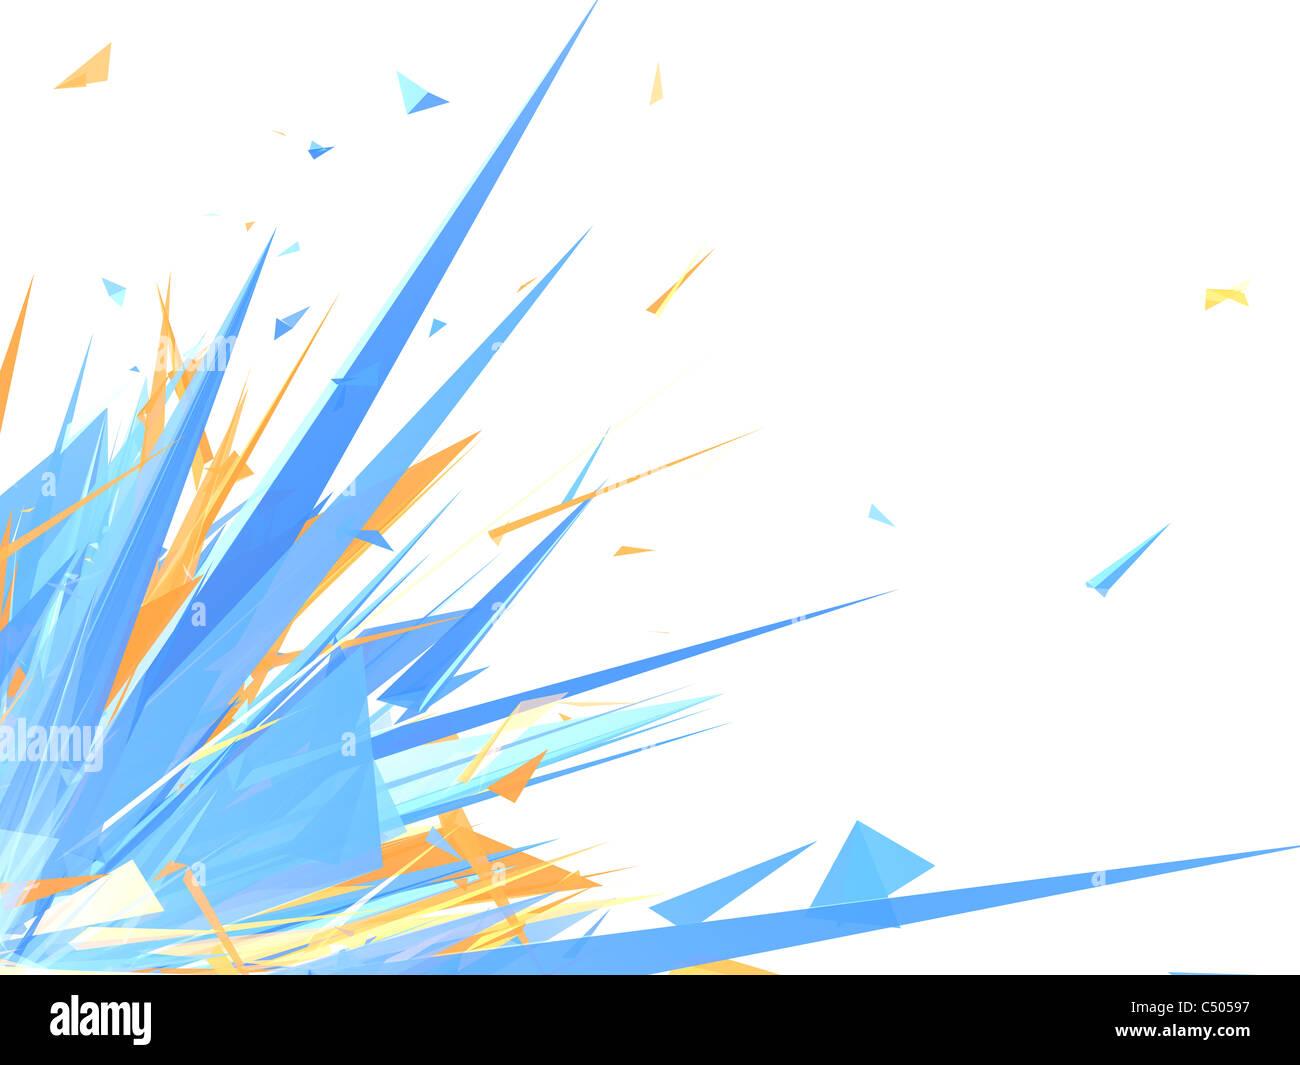 Colorful graphic design - Stock Image